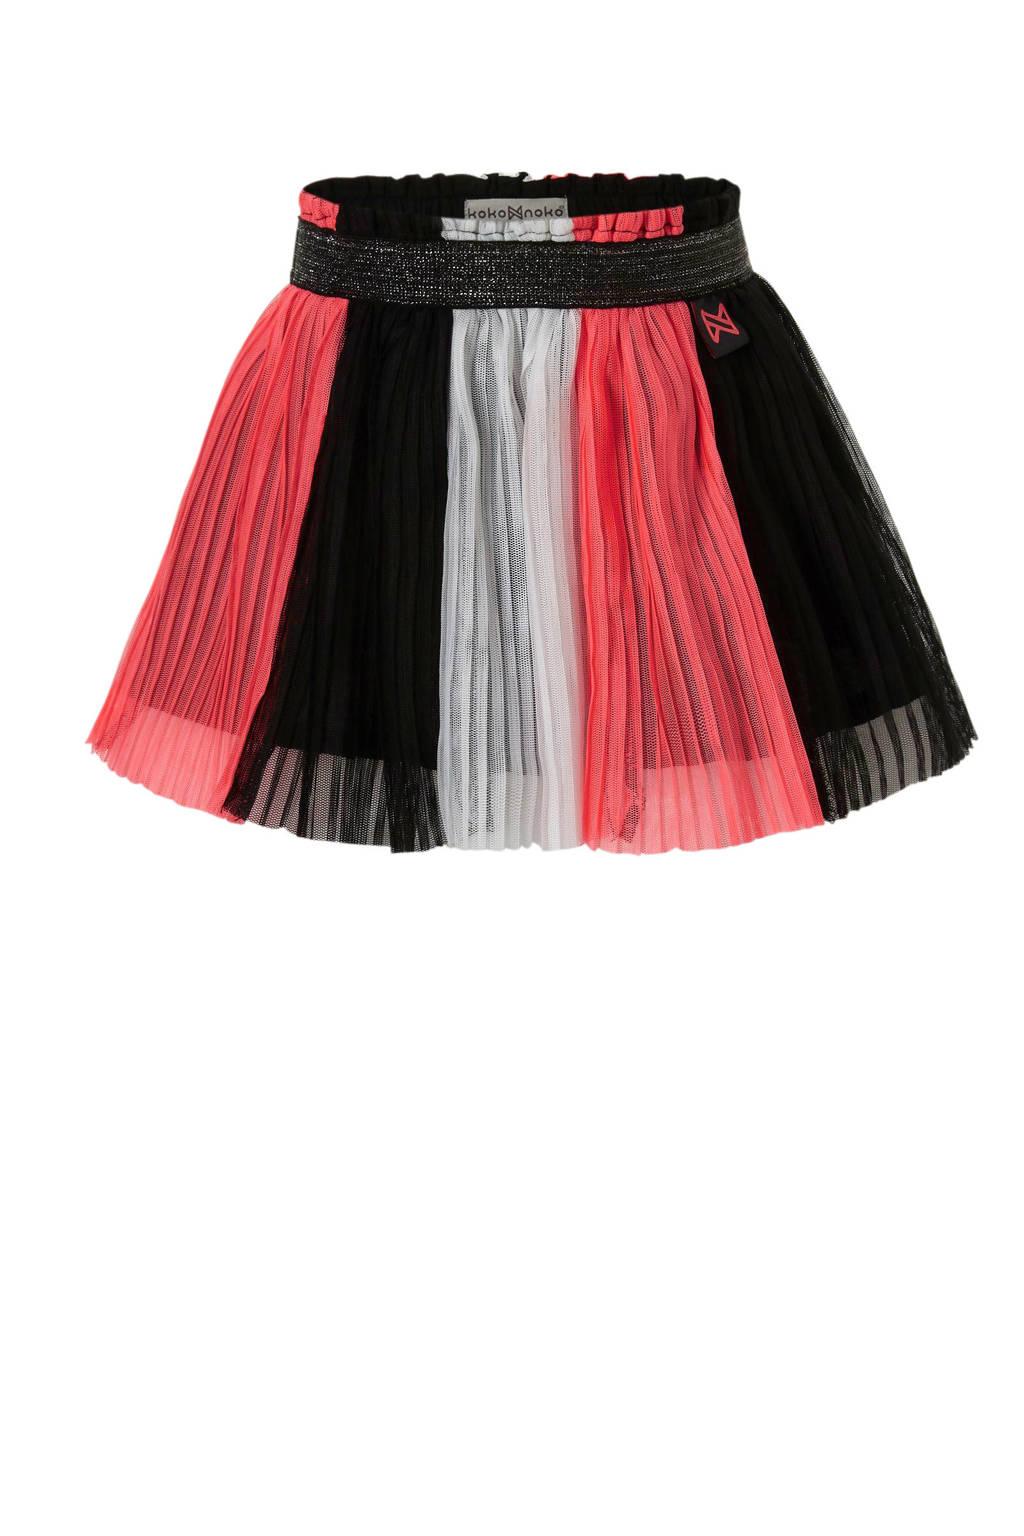 Koko Noko plissé rok roze/zwart, Roze/zwart/wit